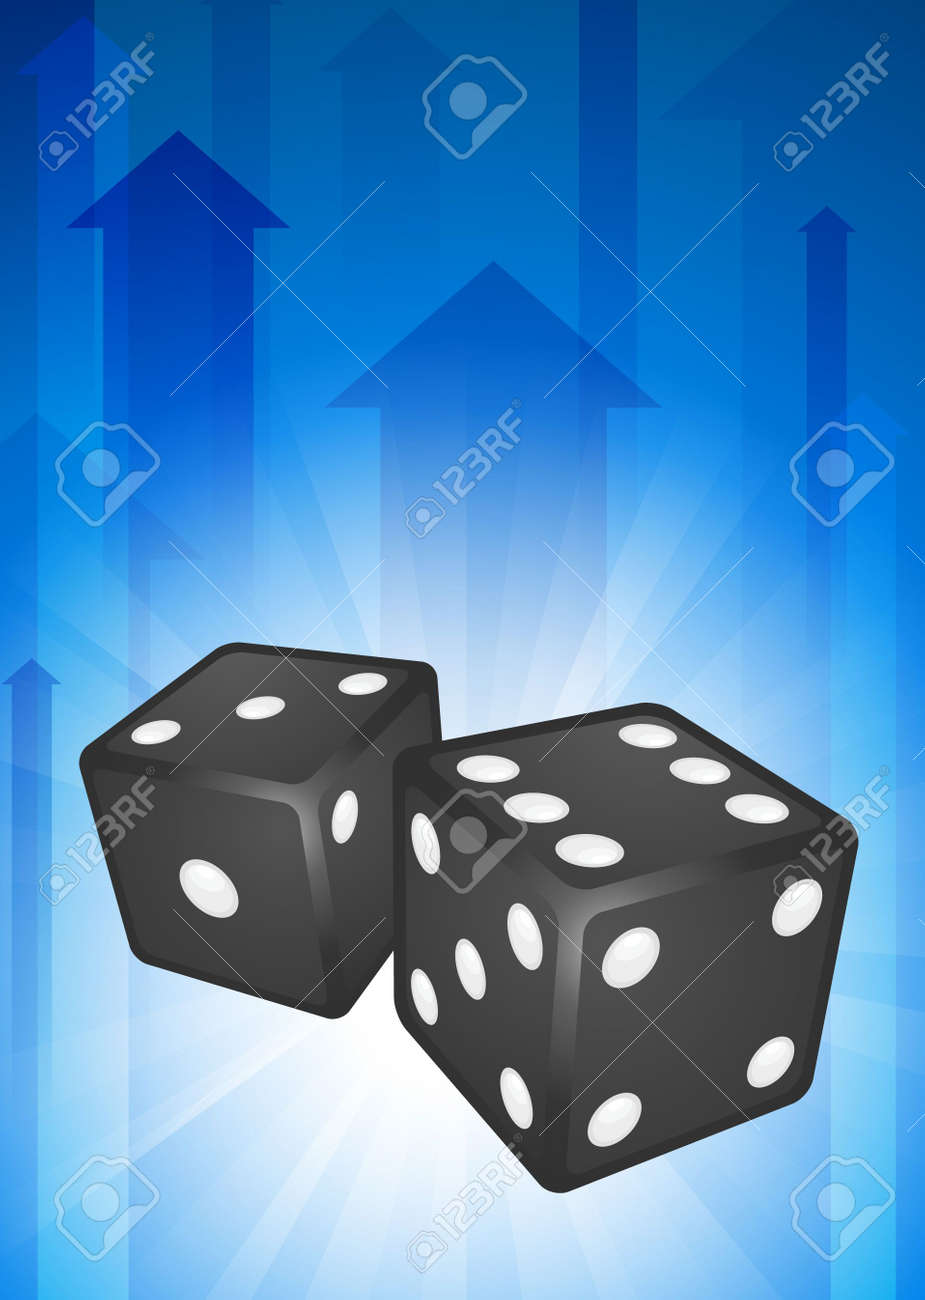 Dice on Blue Arrow BackgroundOriginal Vector Illustration Stock Illustration - 6441177